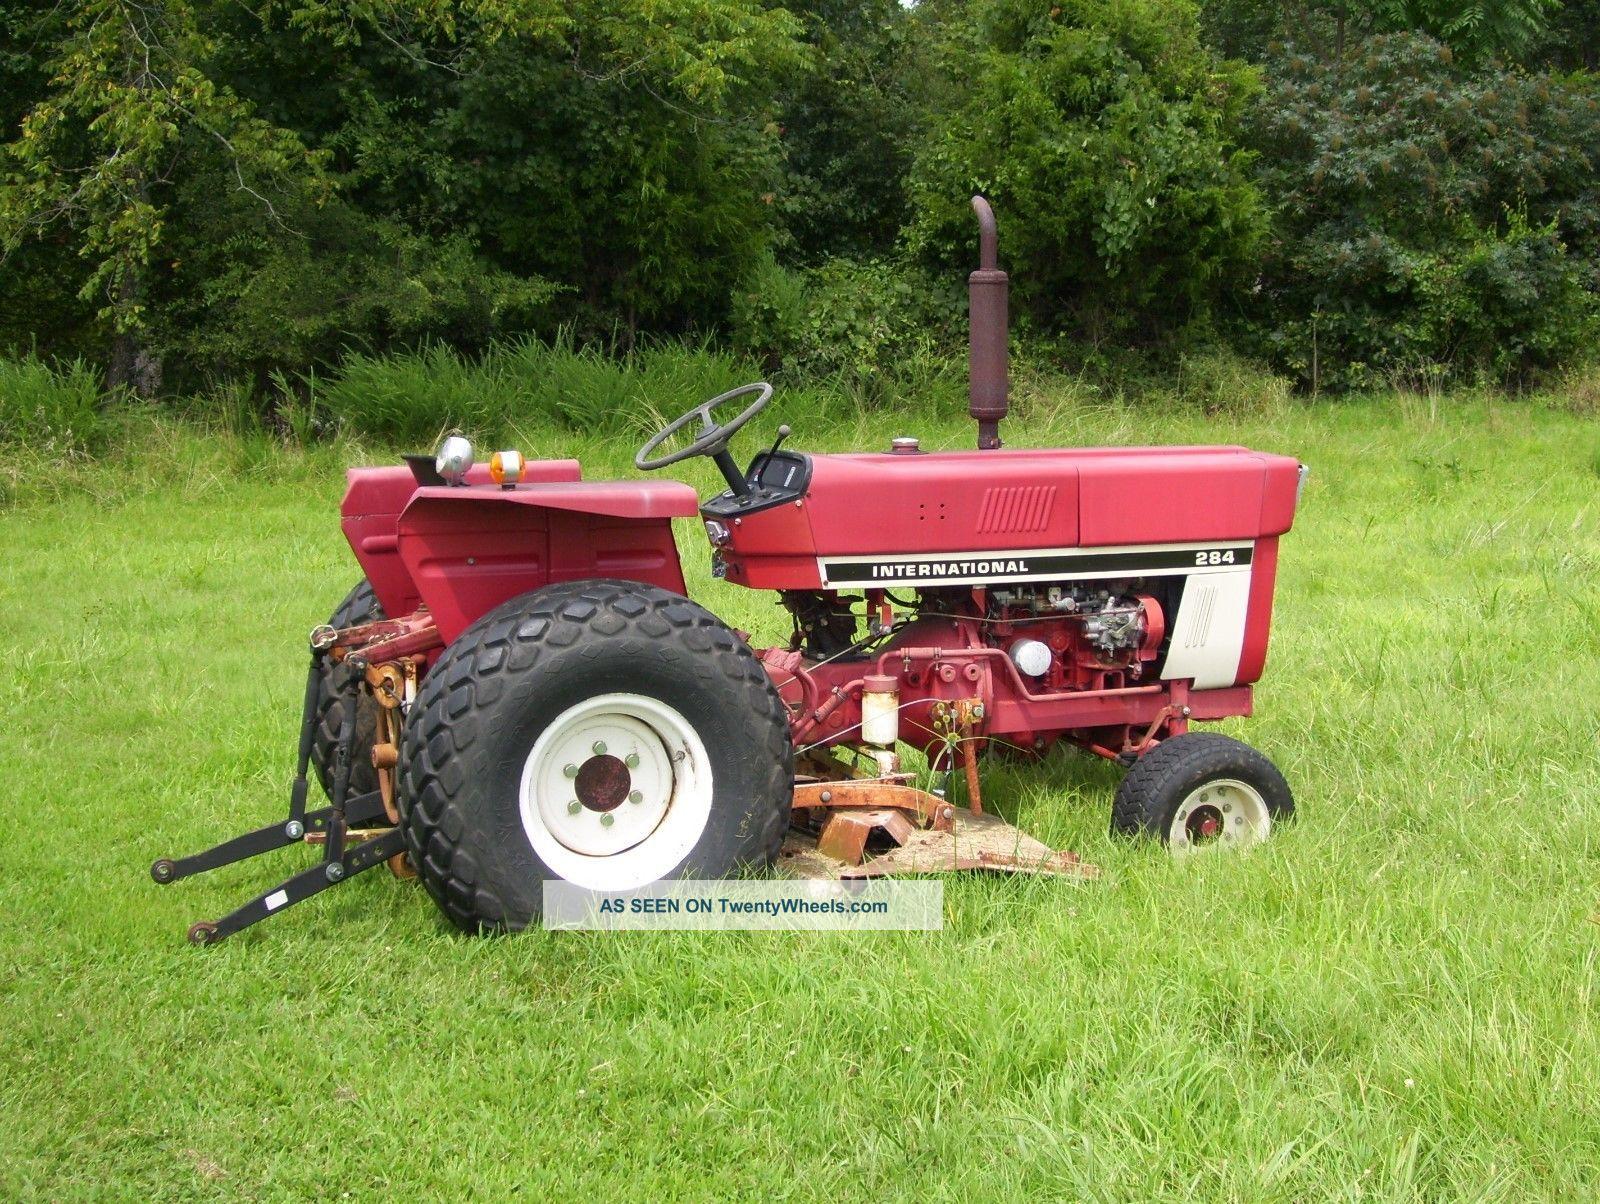 International Harvester 284 Tractor : International harvester model compact tractor